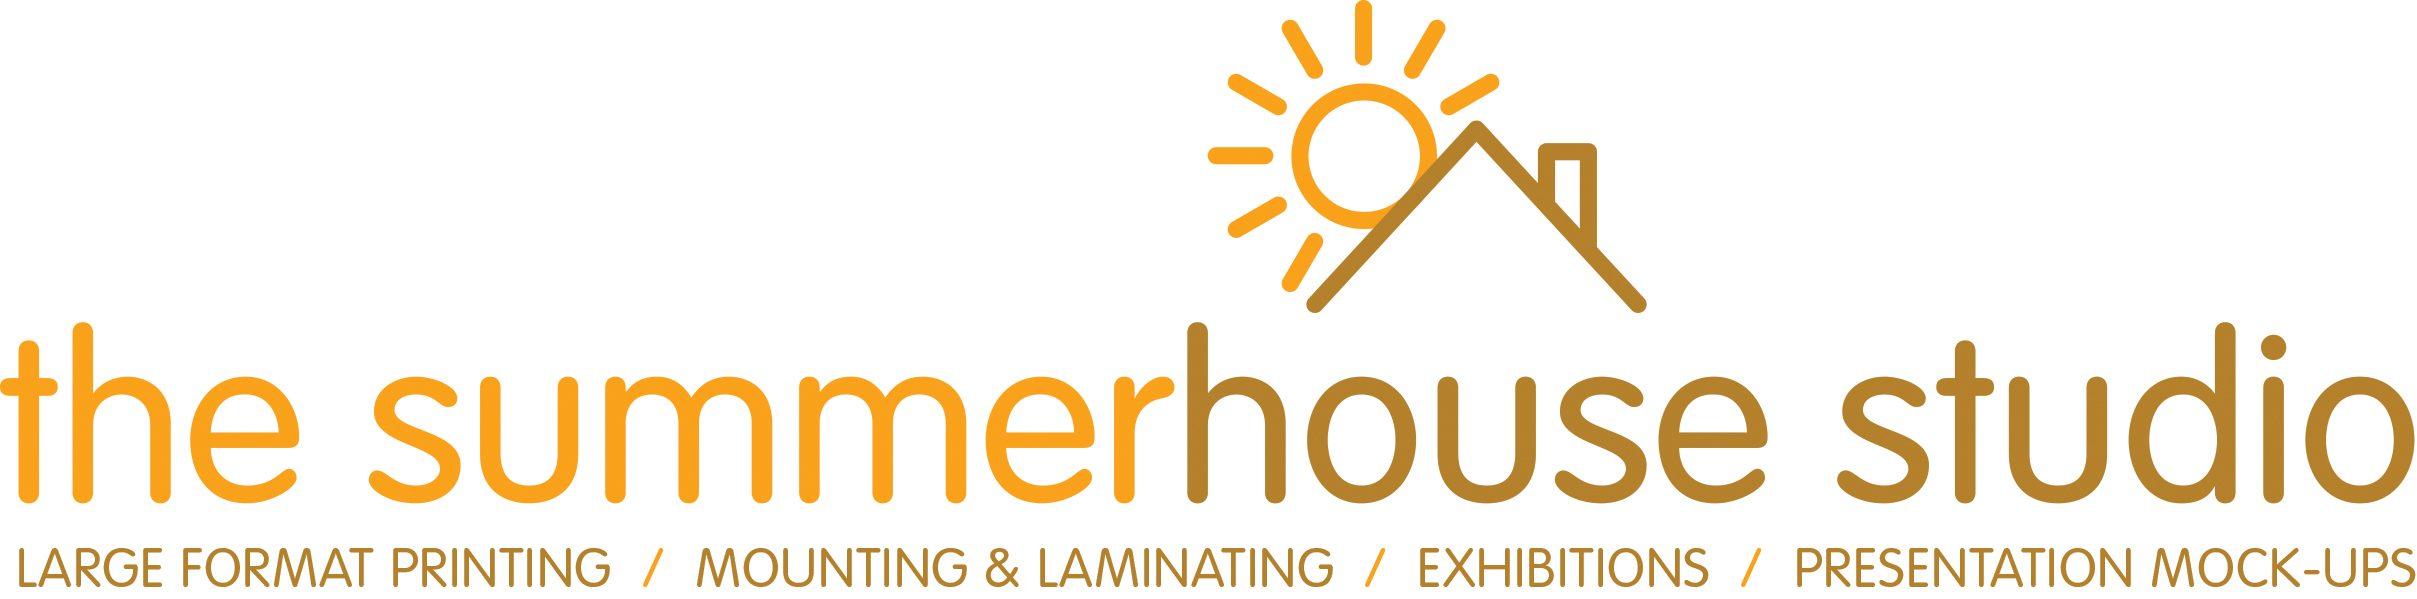 The Summerhouse Studio